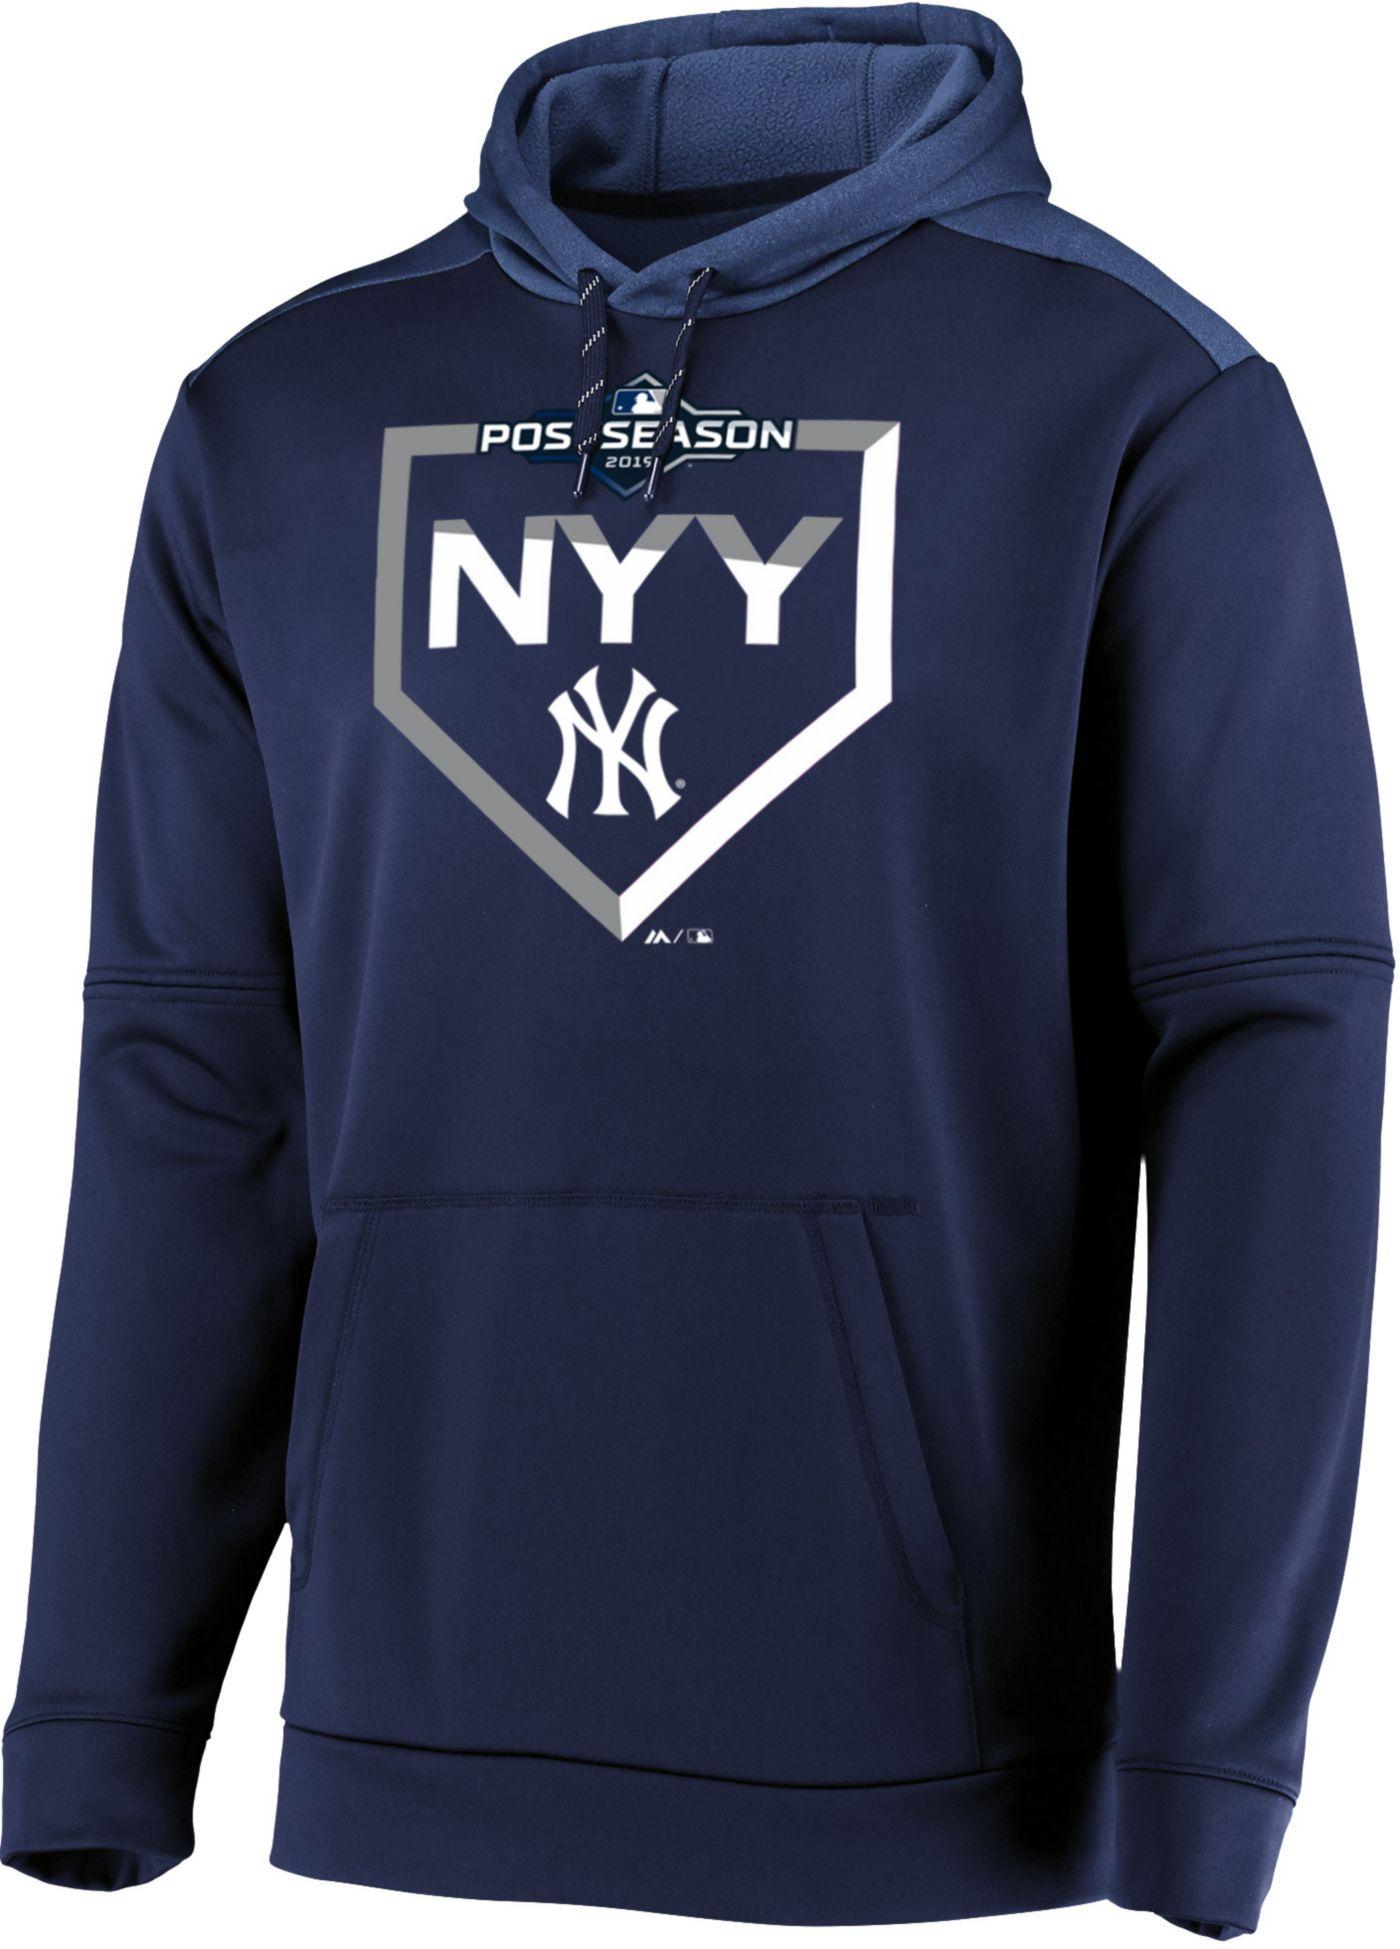 Majestic Men's New York Yankees 2019 MLB Postseason On-Field Therma Base Hoodie